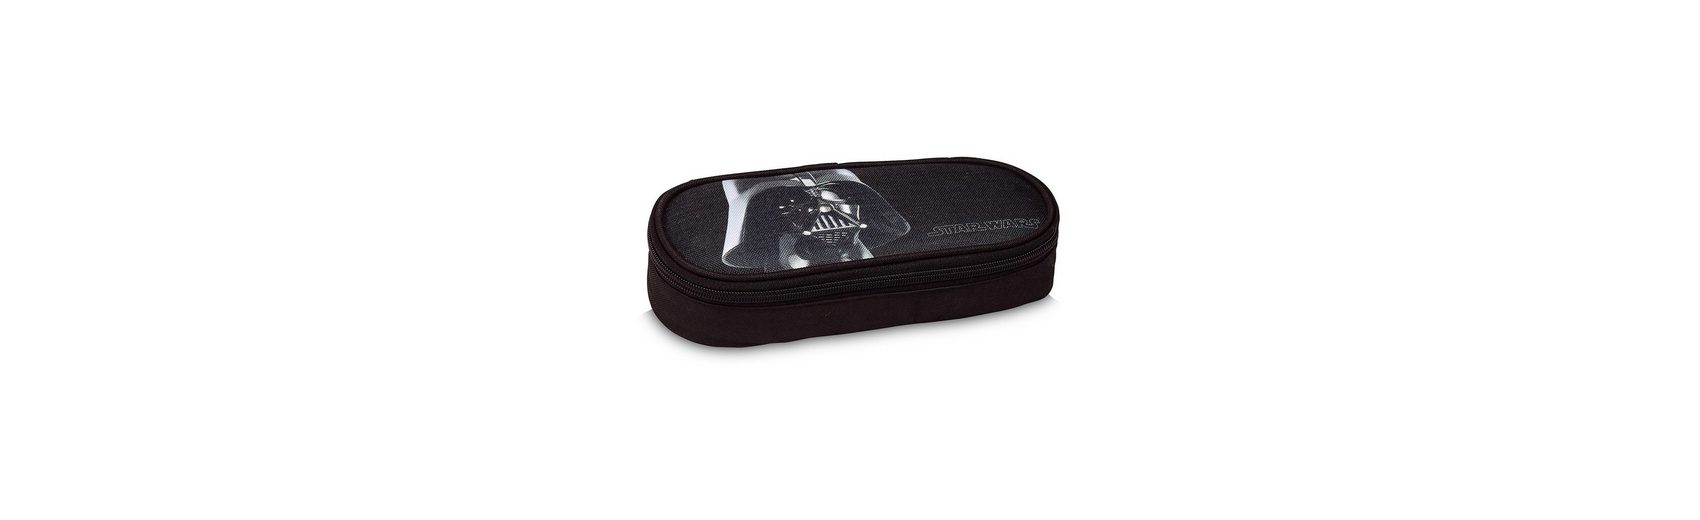 Etui-Box Star Wars Darth Vader